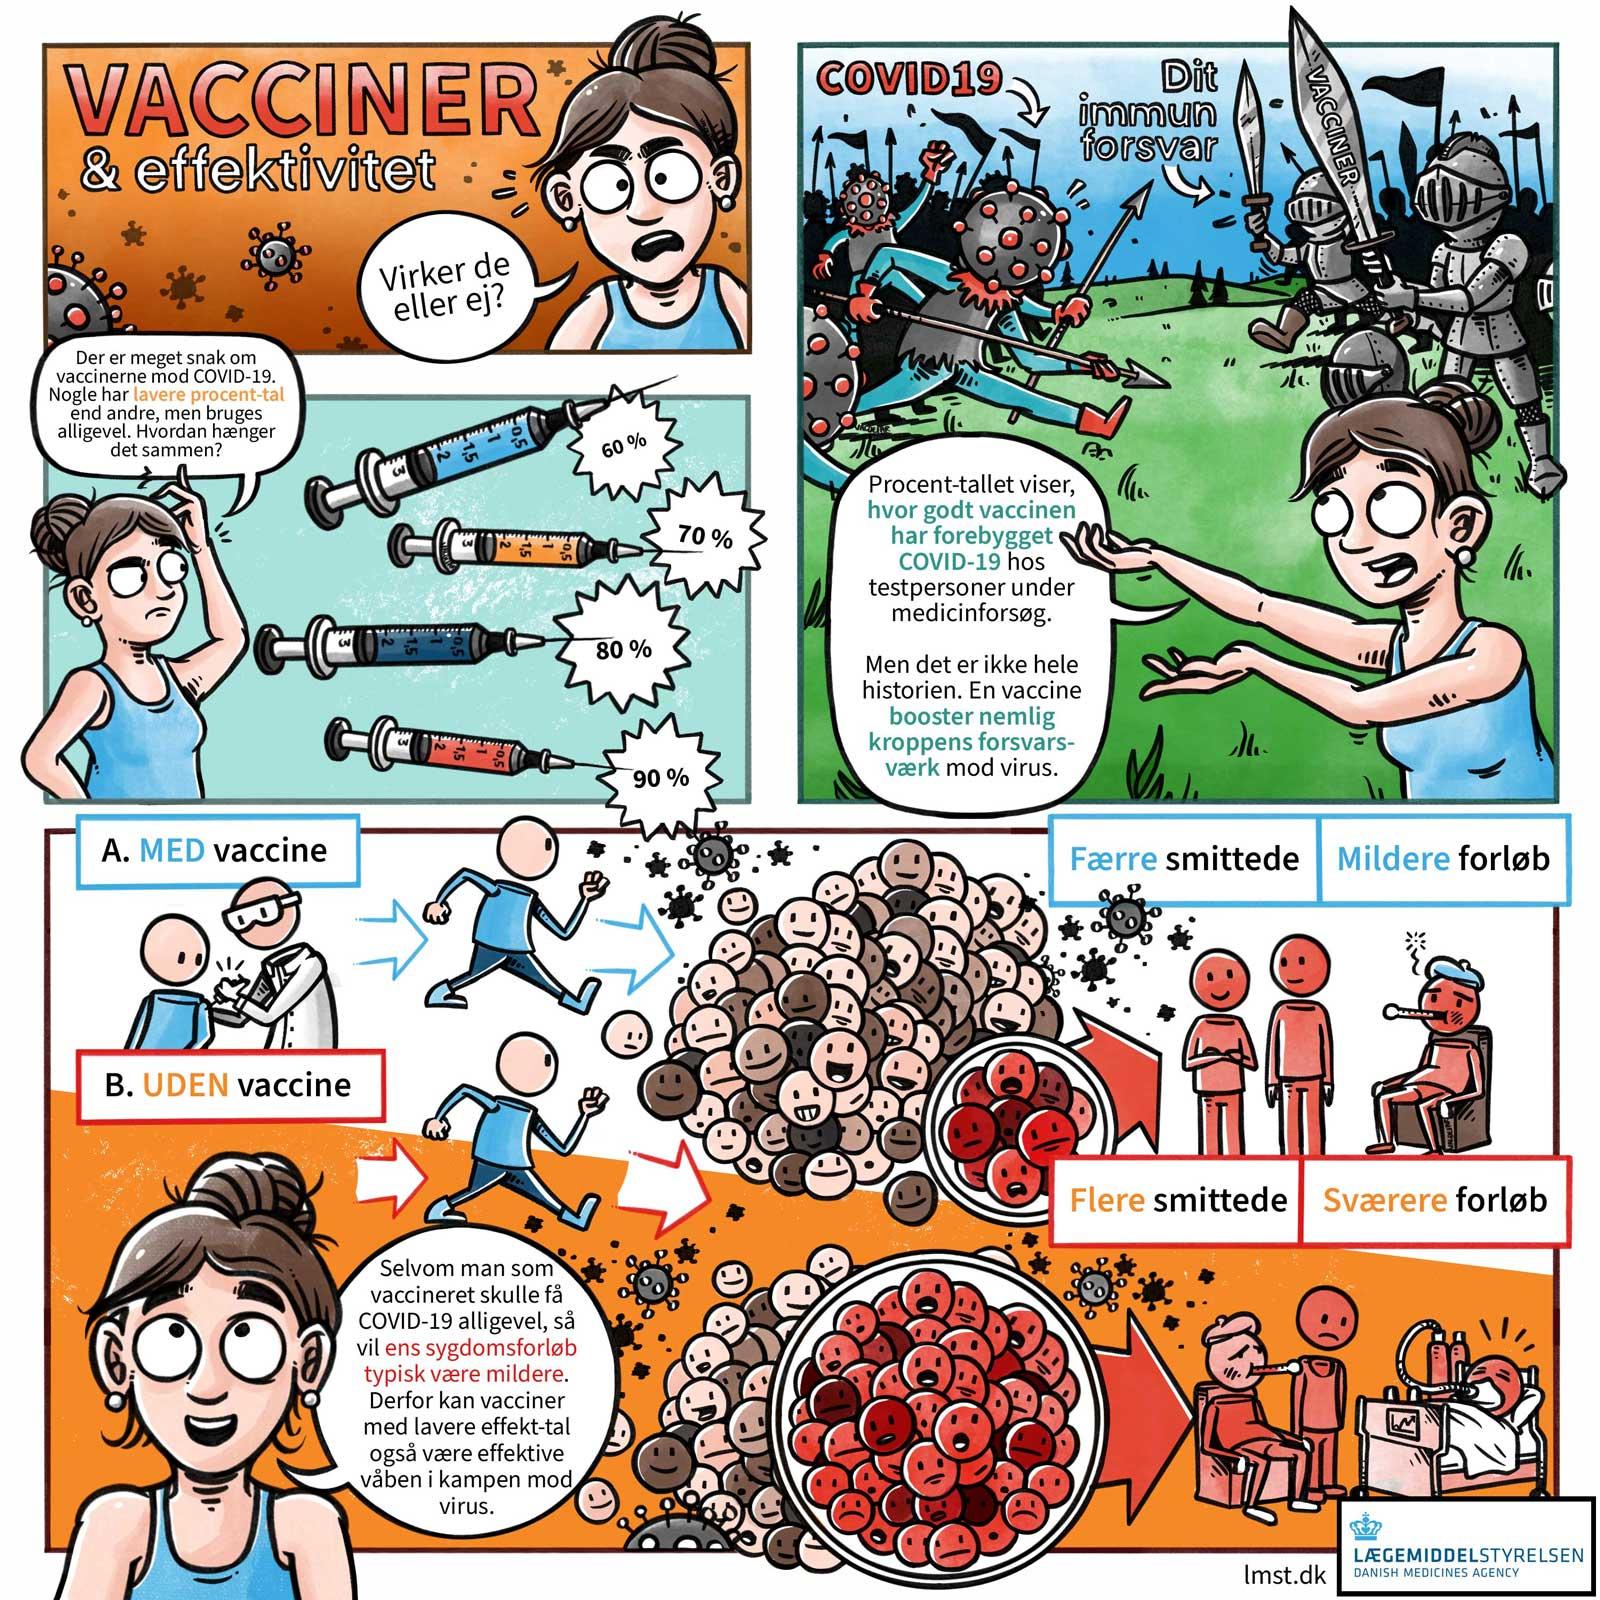 Stribe for Lægemiddelstyrelsen. Vacciner mod COVID-19: Effektivitet